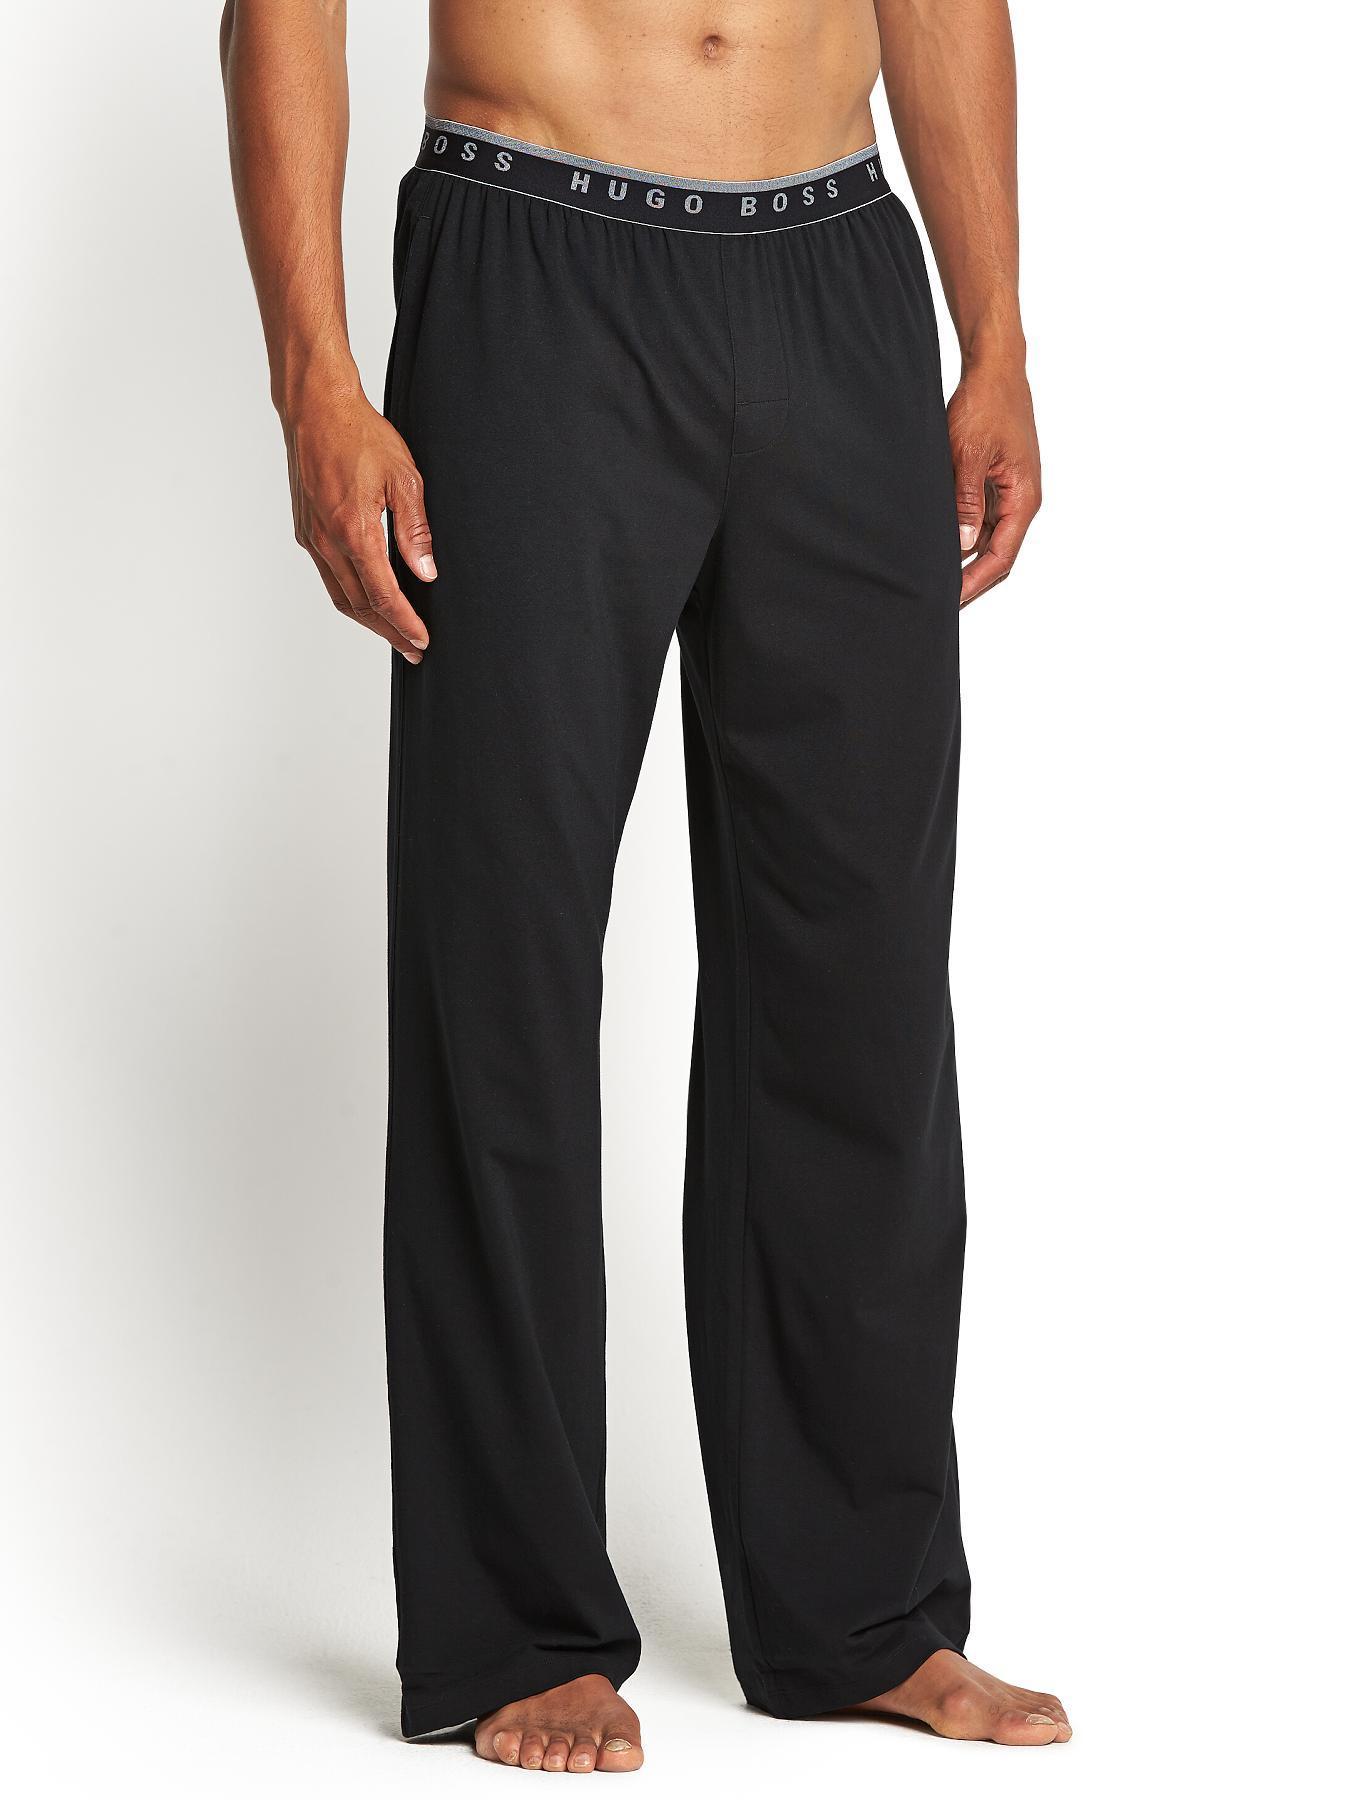 Hugo Boss Mens Core Lounge Pants - Black, Black